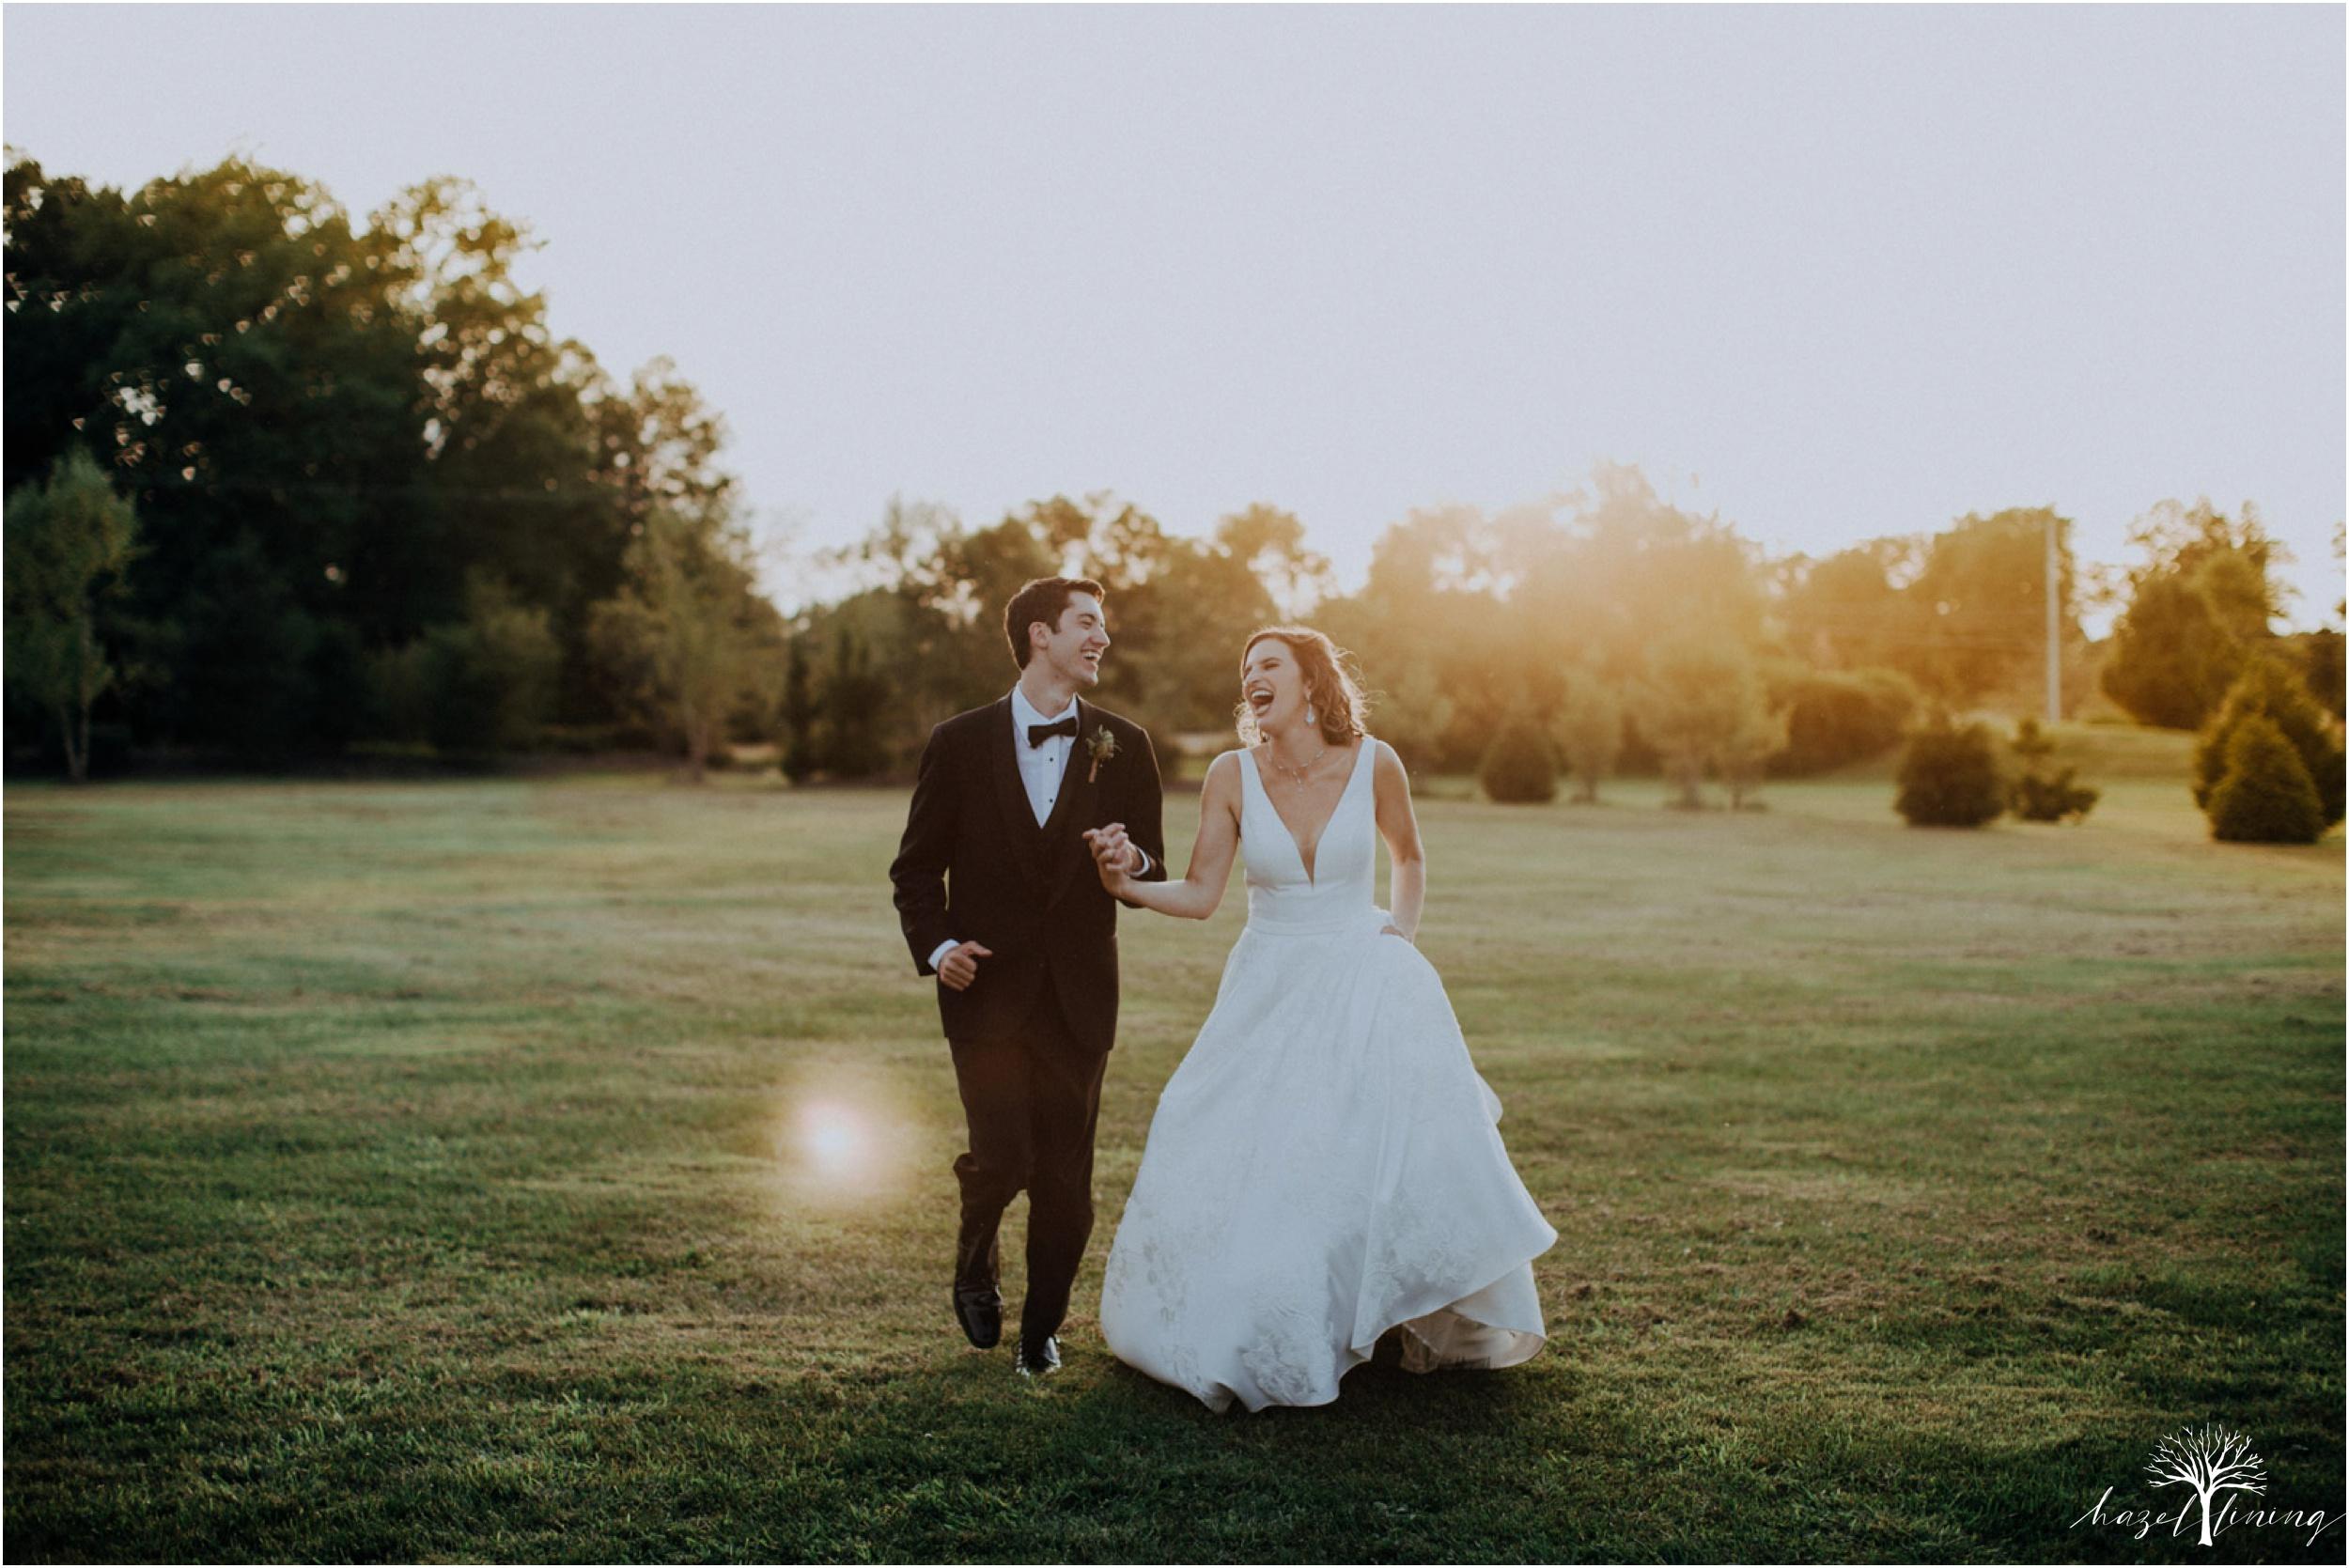 maureen-hepner-anthony-giordano-rose-bank-winery-newtow-pennsylvania-luxury-summer-wedding-hazel-lining-photography-destination-elopement-wedding-engagement-photography_0171.jpg